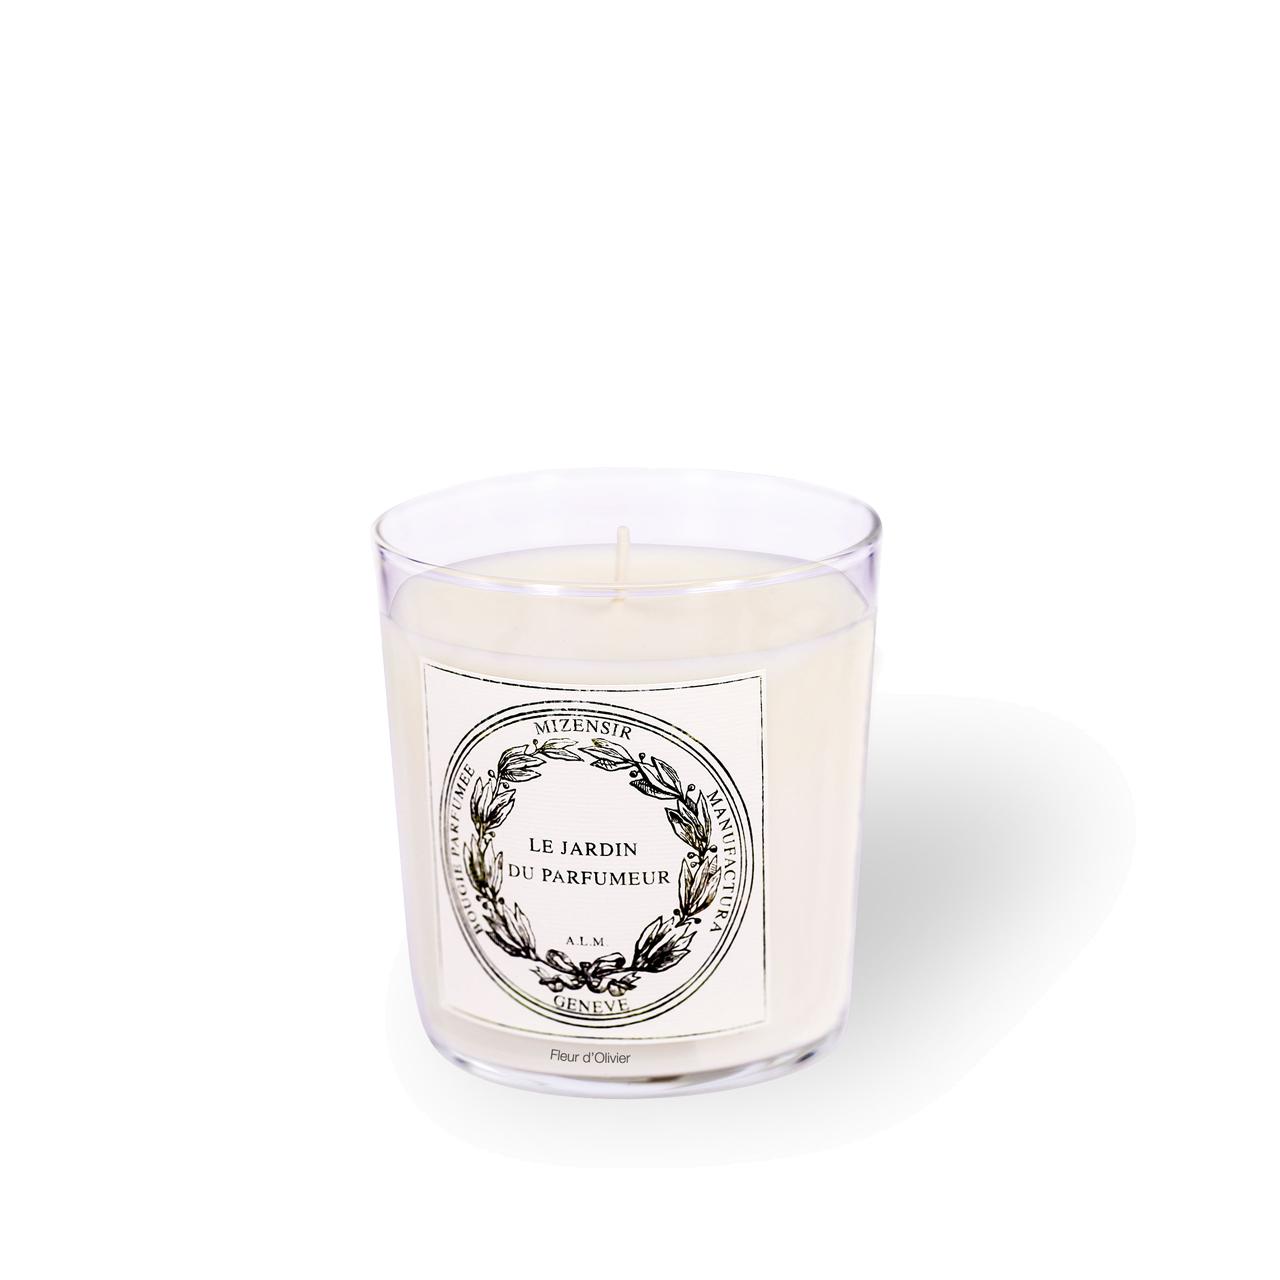 Fleur d'Olivier - Candle